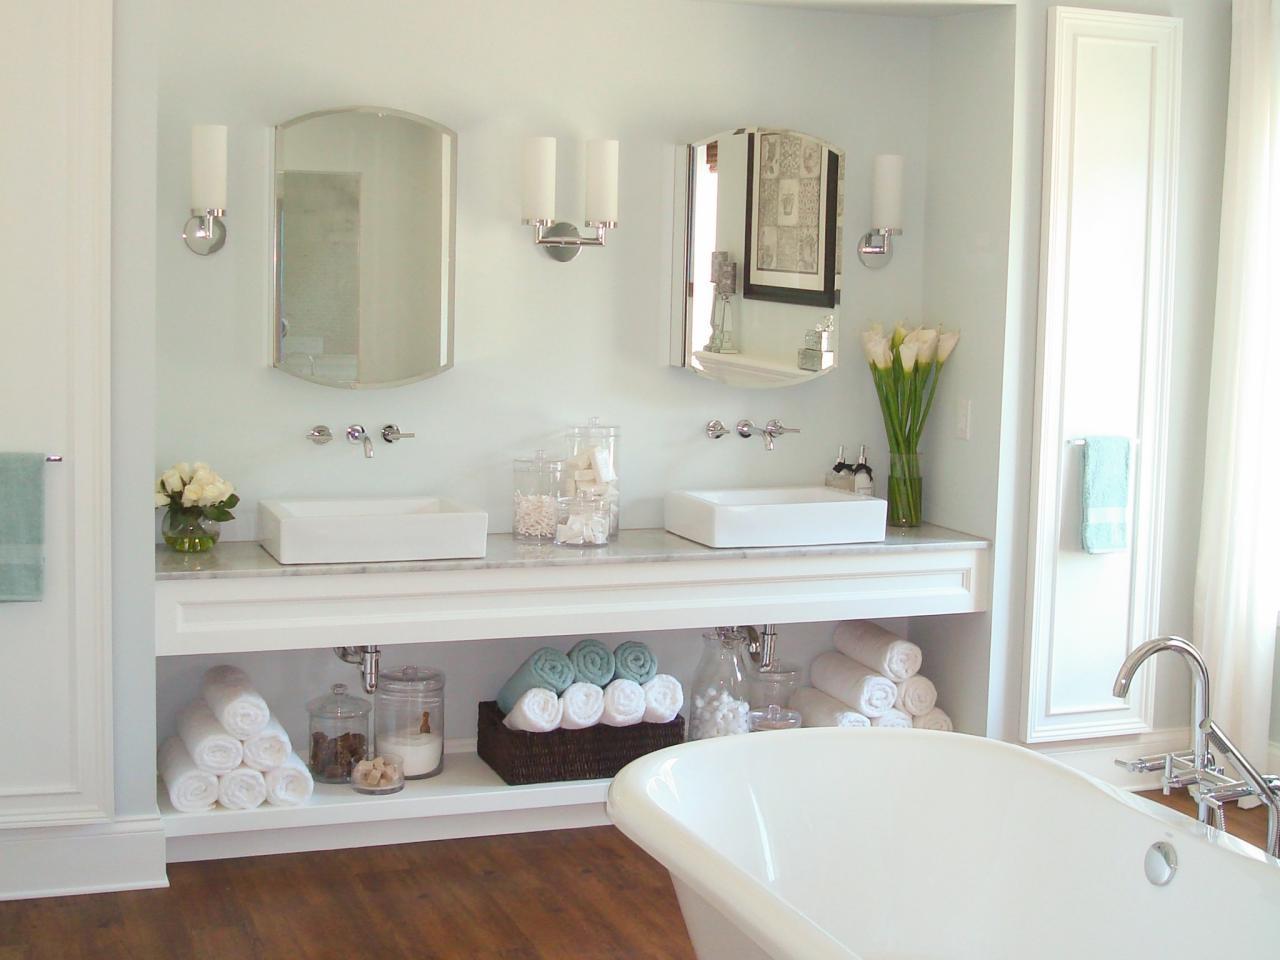 latest bathroom faucet trends latest bathroom faucet trends 2016 bathroom trends washroom bathroom master bath trends part 1 1280 x 960 jpeg